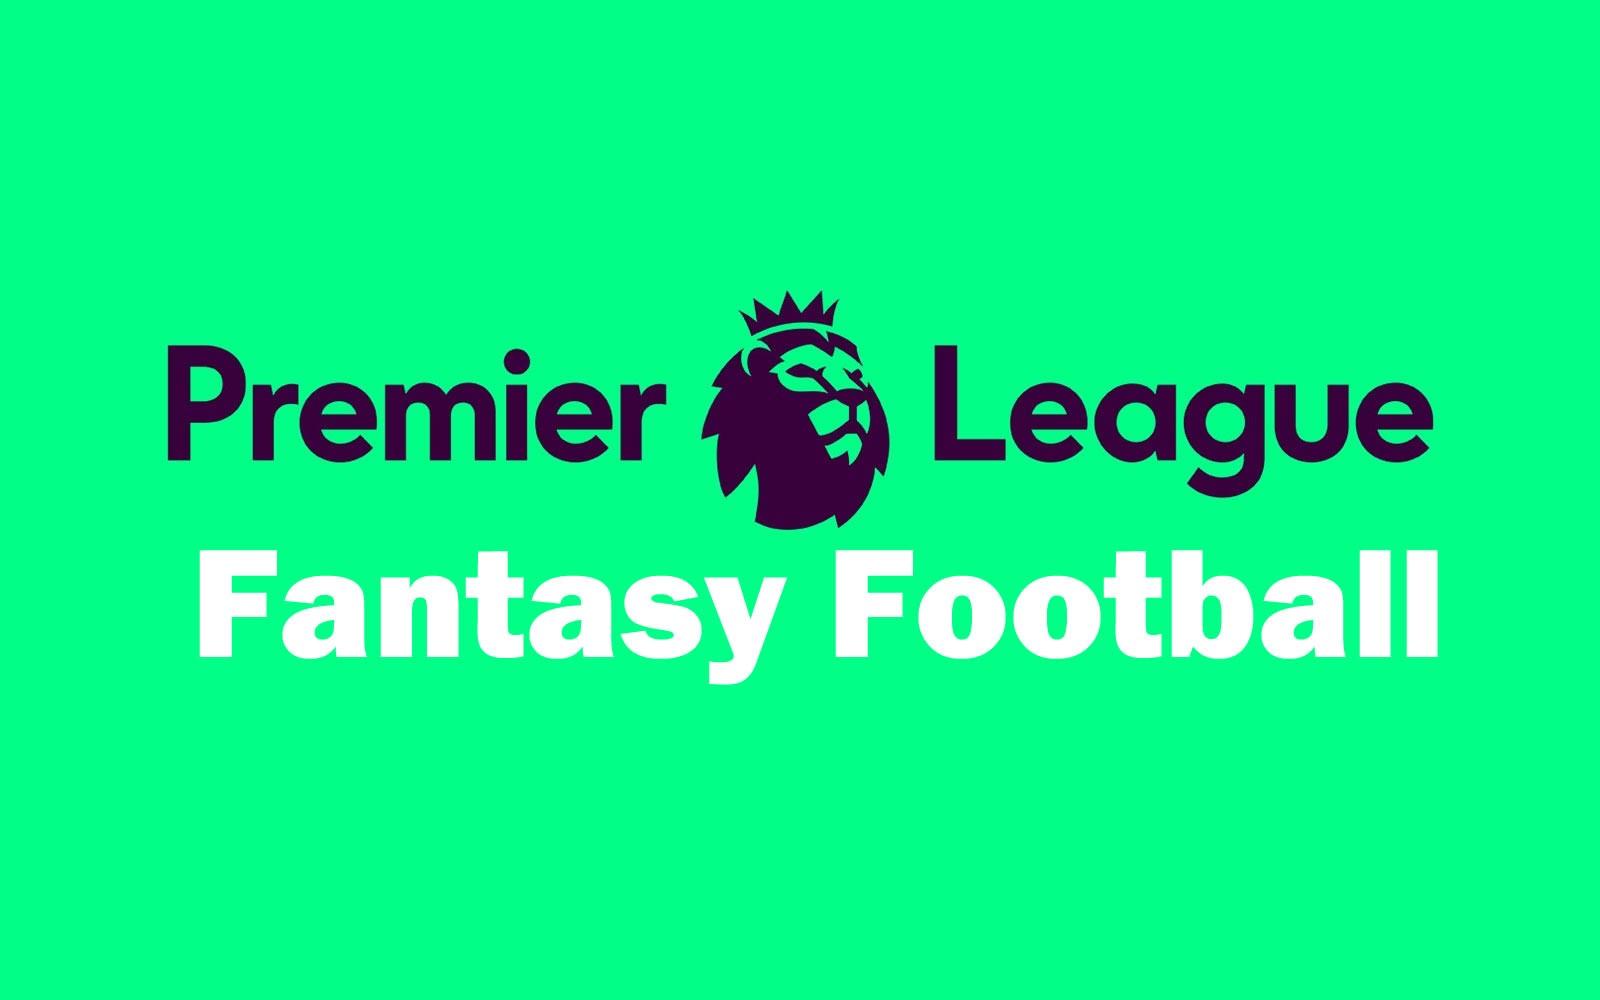 Sign up to the Corinthian Fantasy Football League